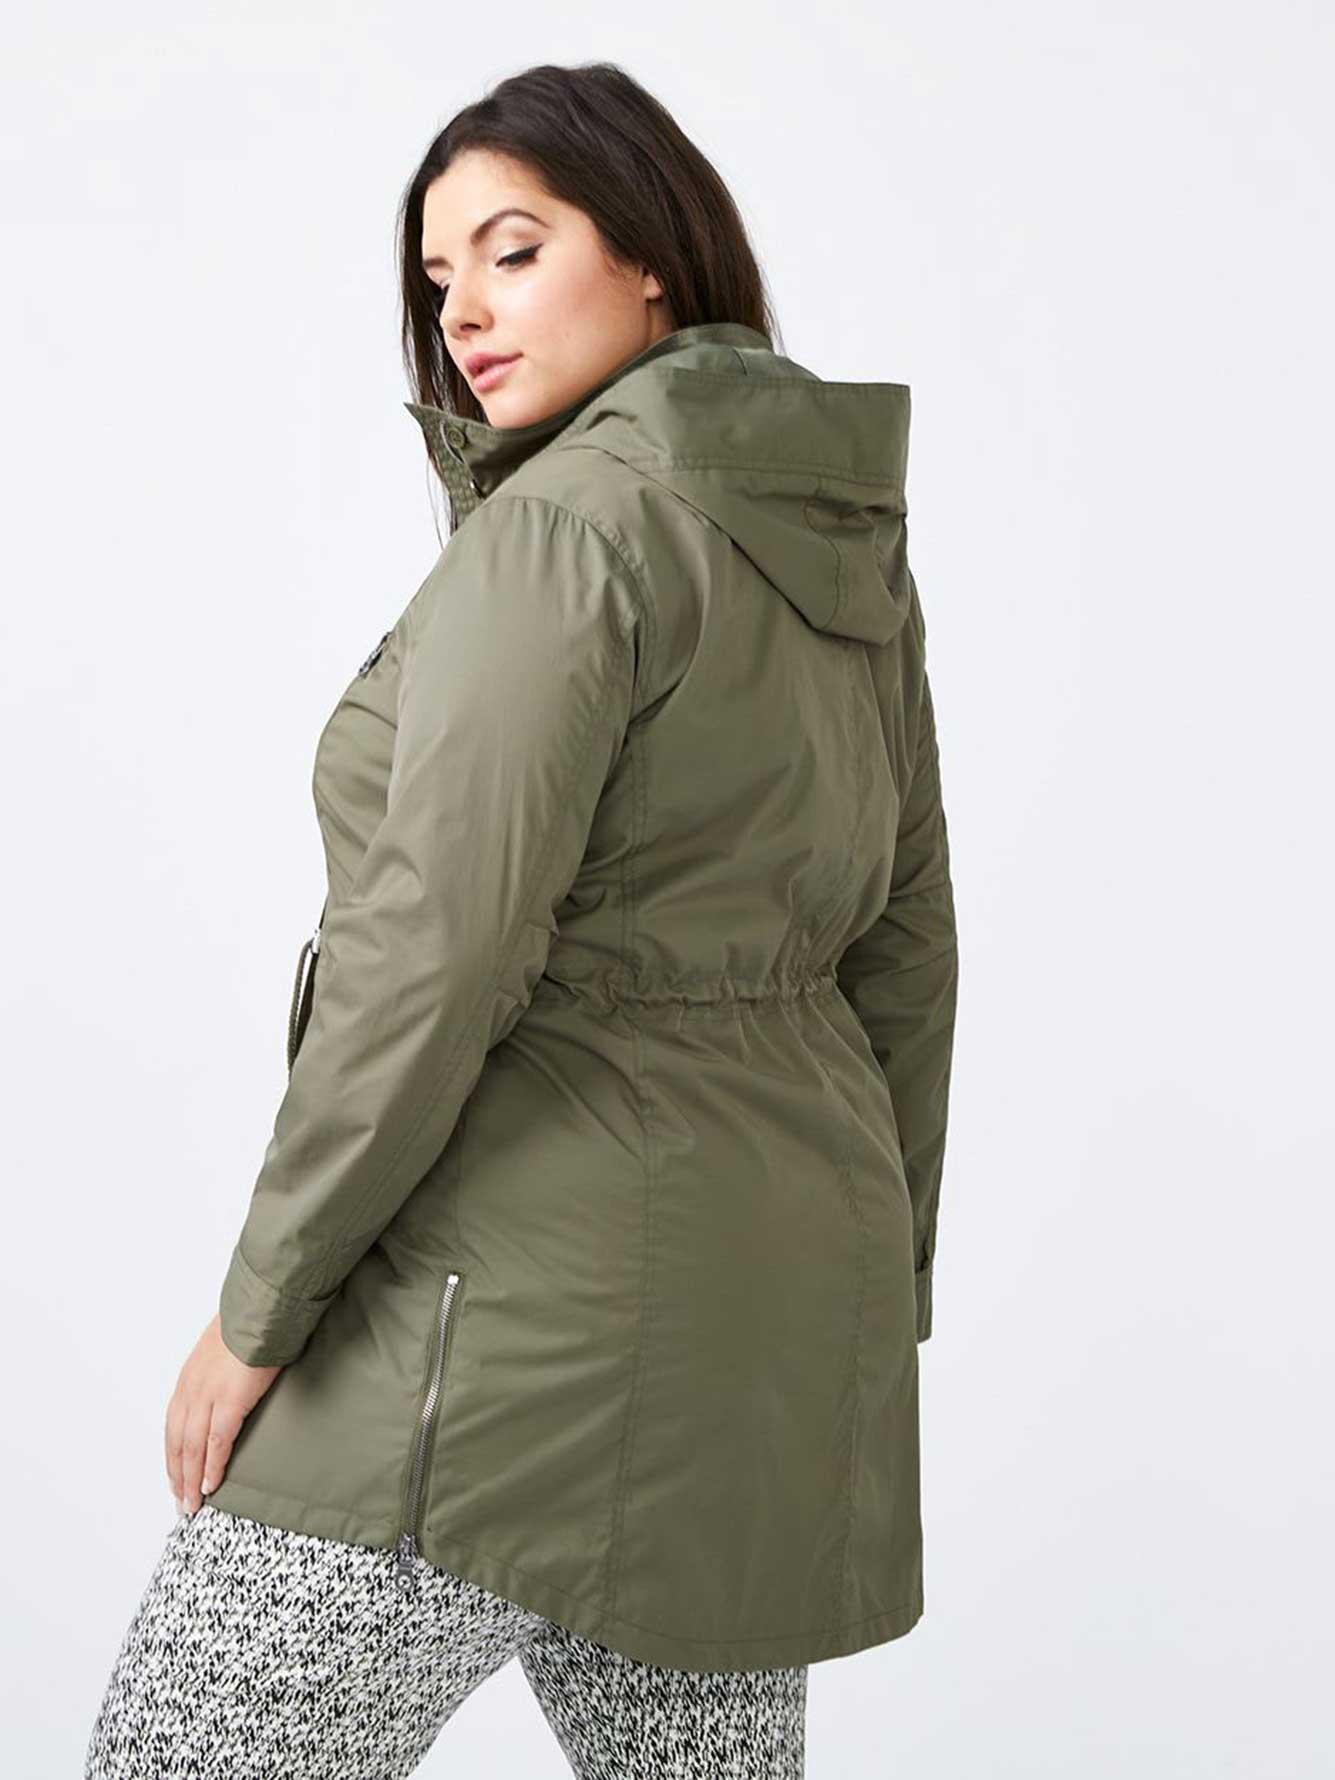 3588067df35 Parka Rain Jacket - In Every Story